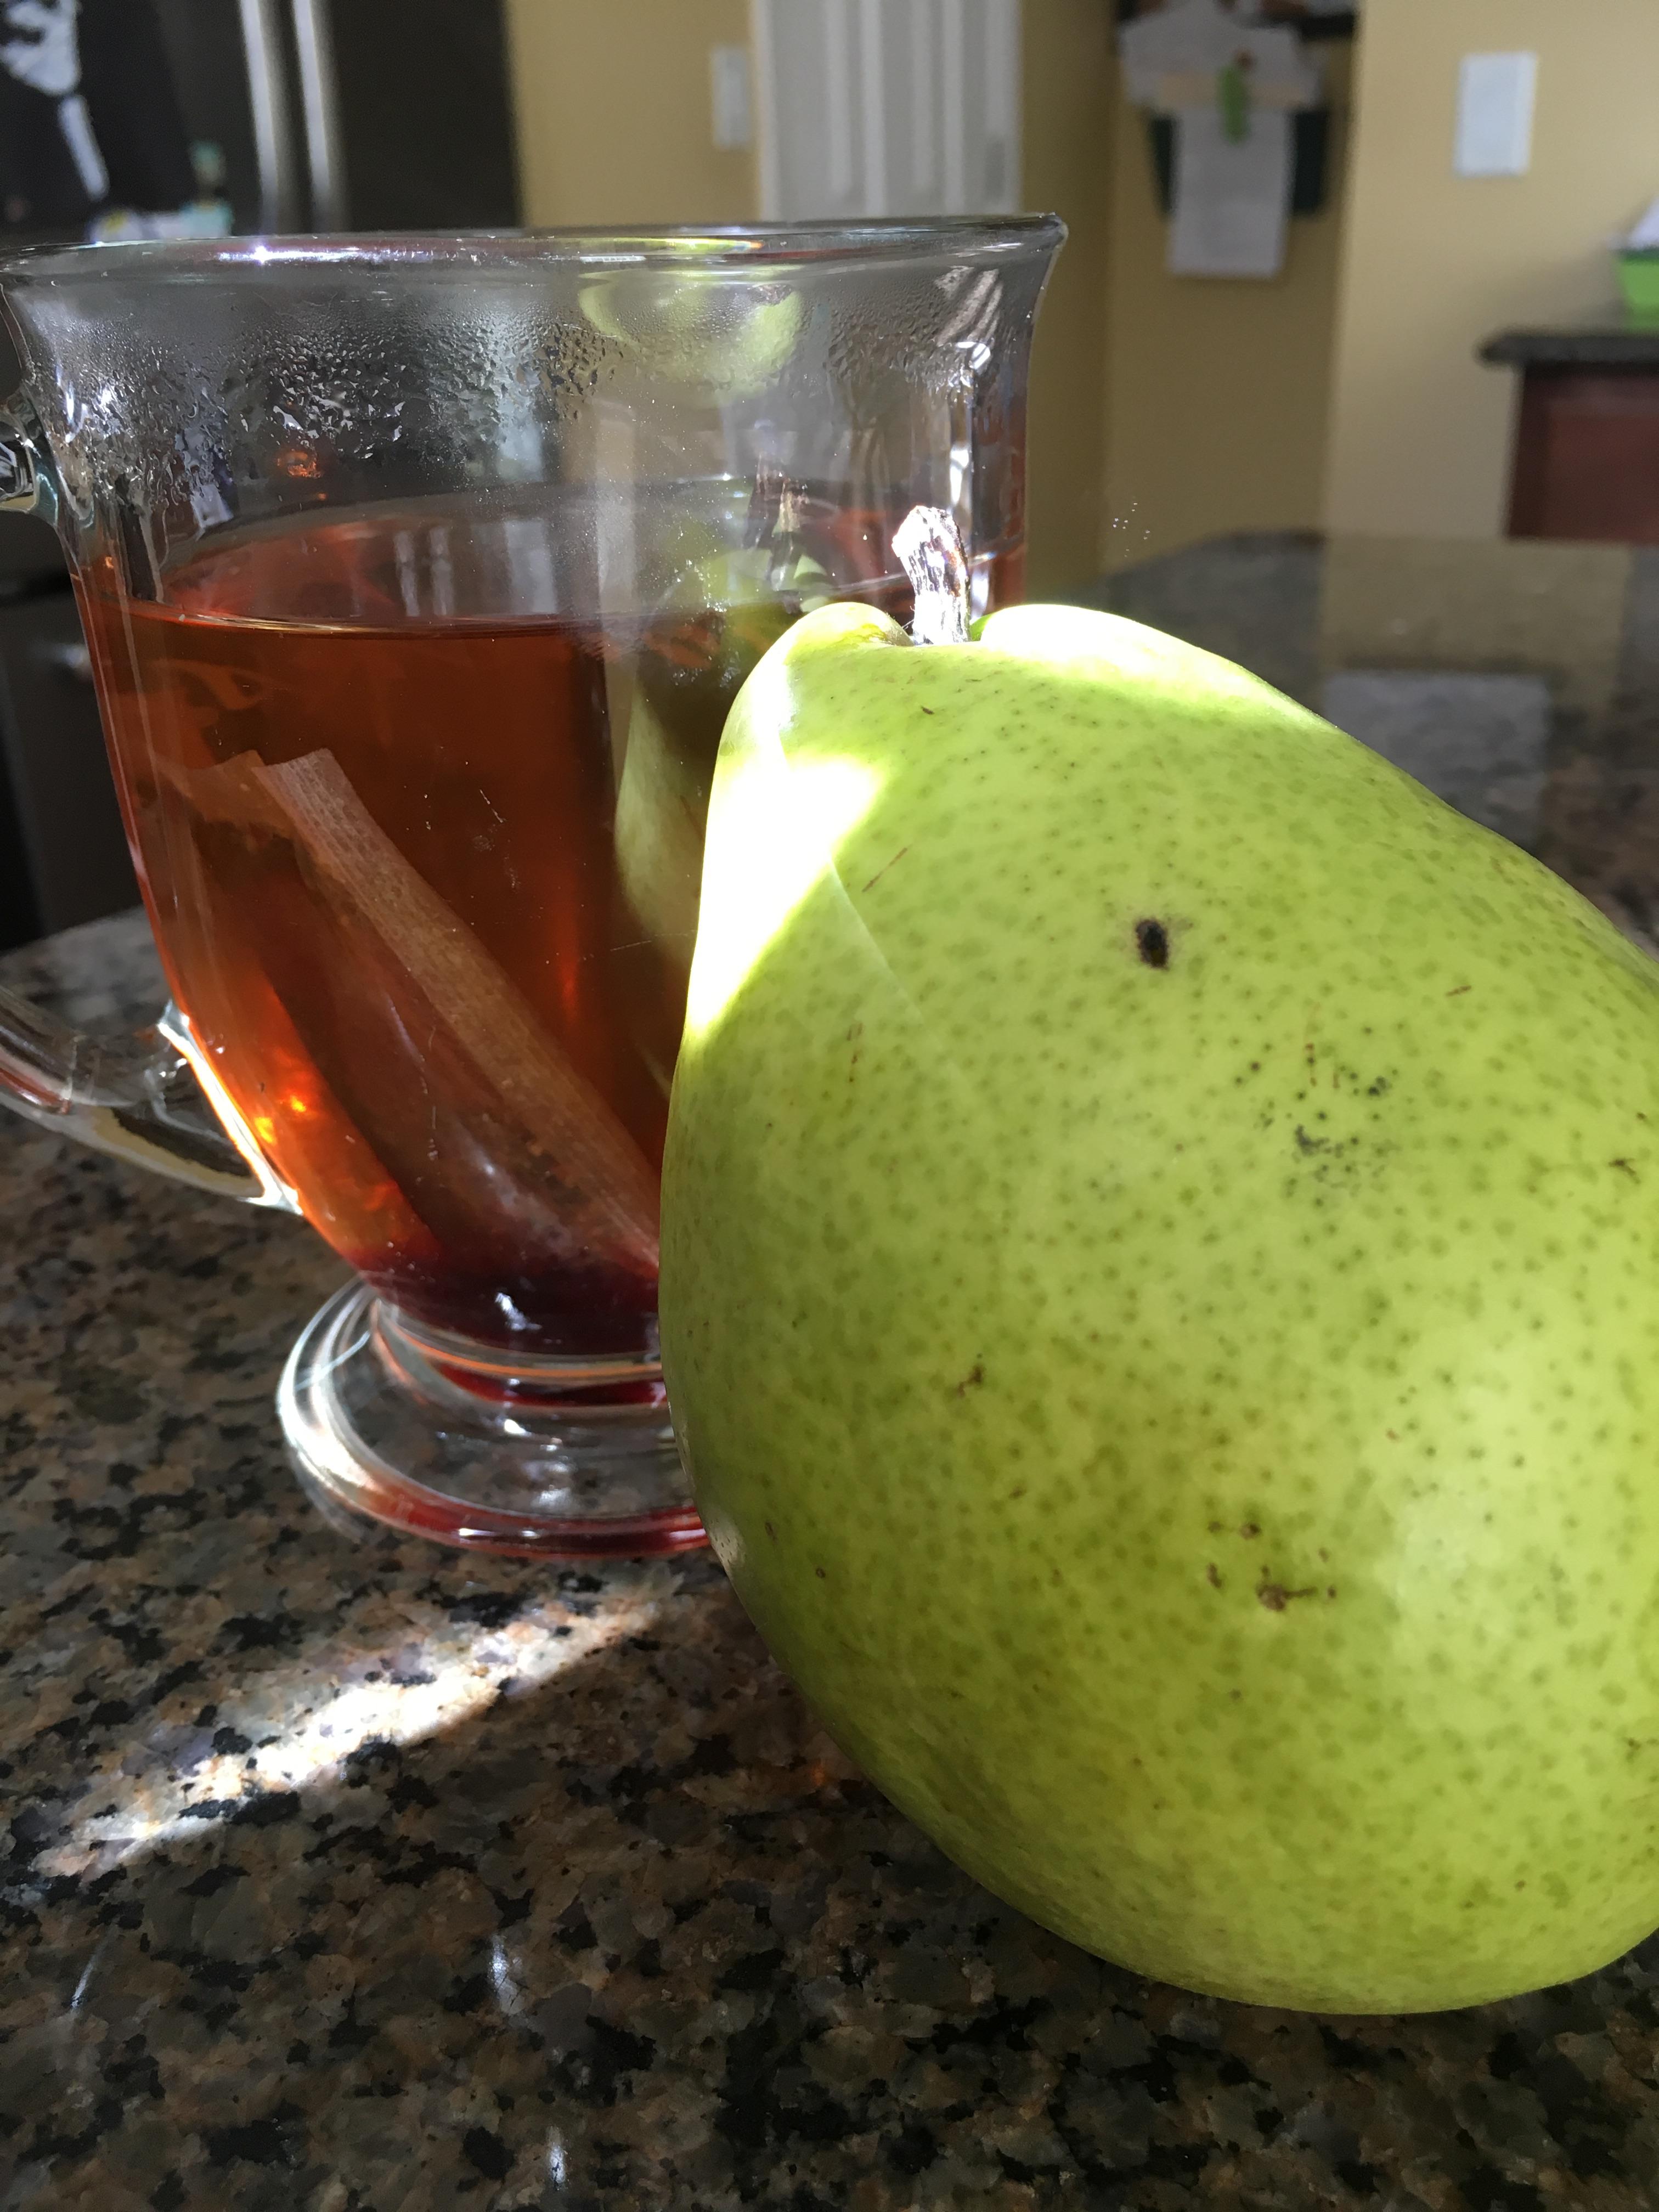 herbal tea and pear